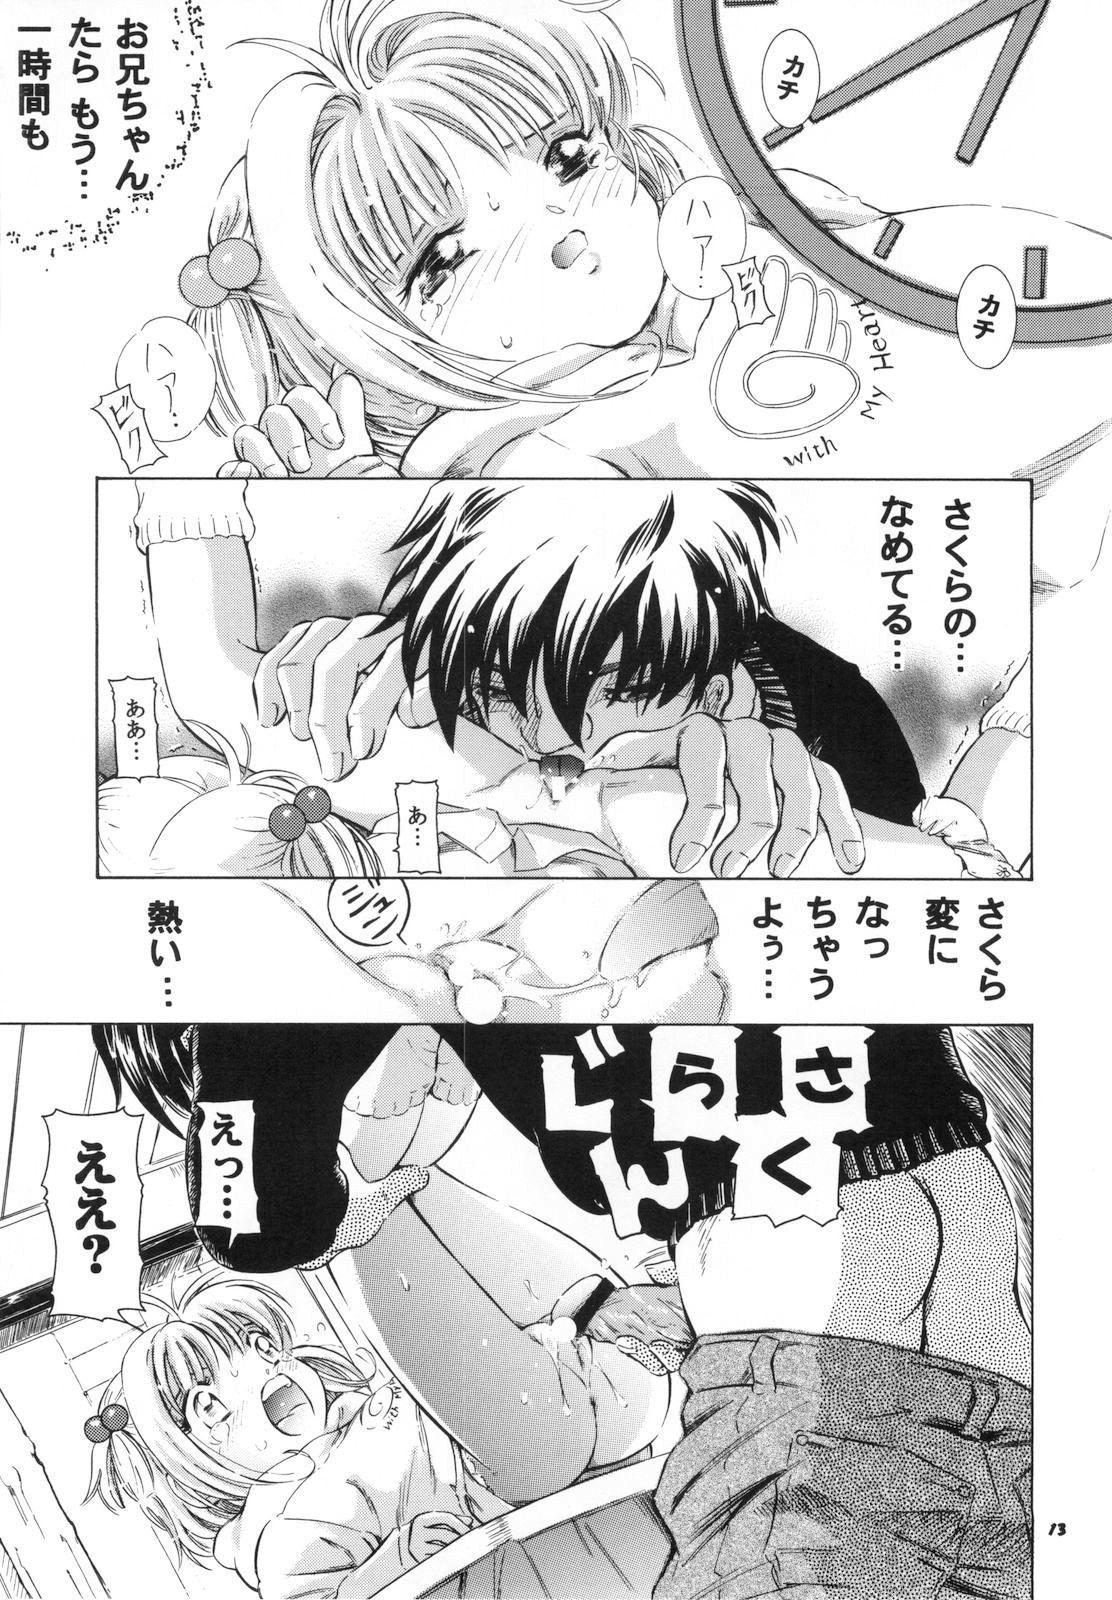 Sakura DROP4 Melon 11